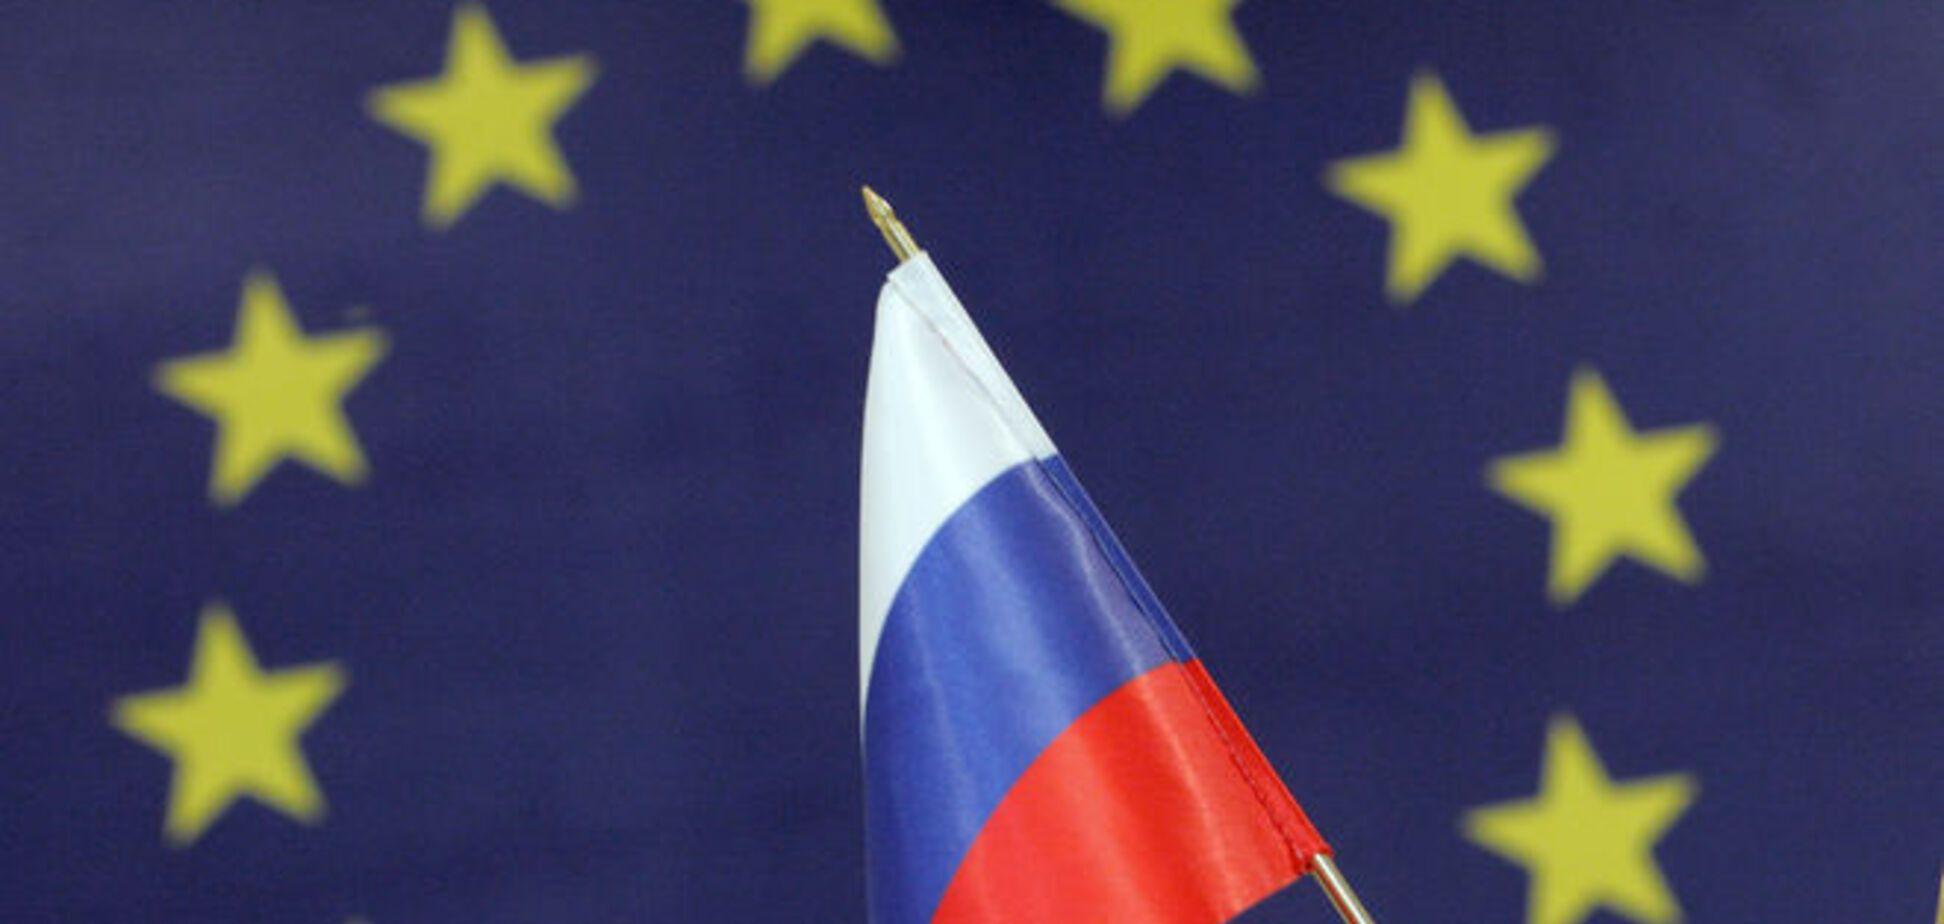 Европа 'ходит на цыпочках' перед российским агрессором – Washington Post